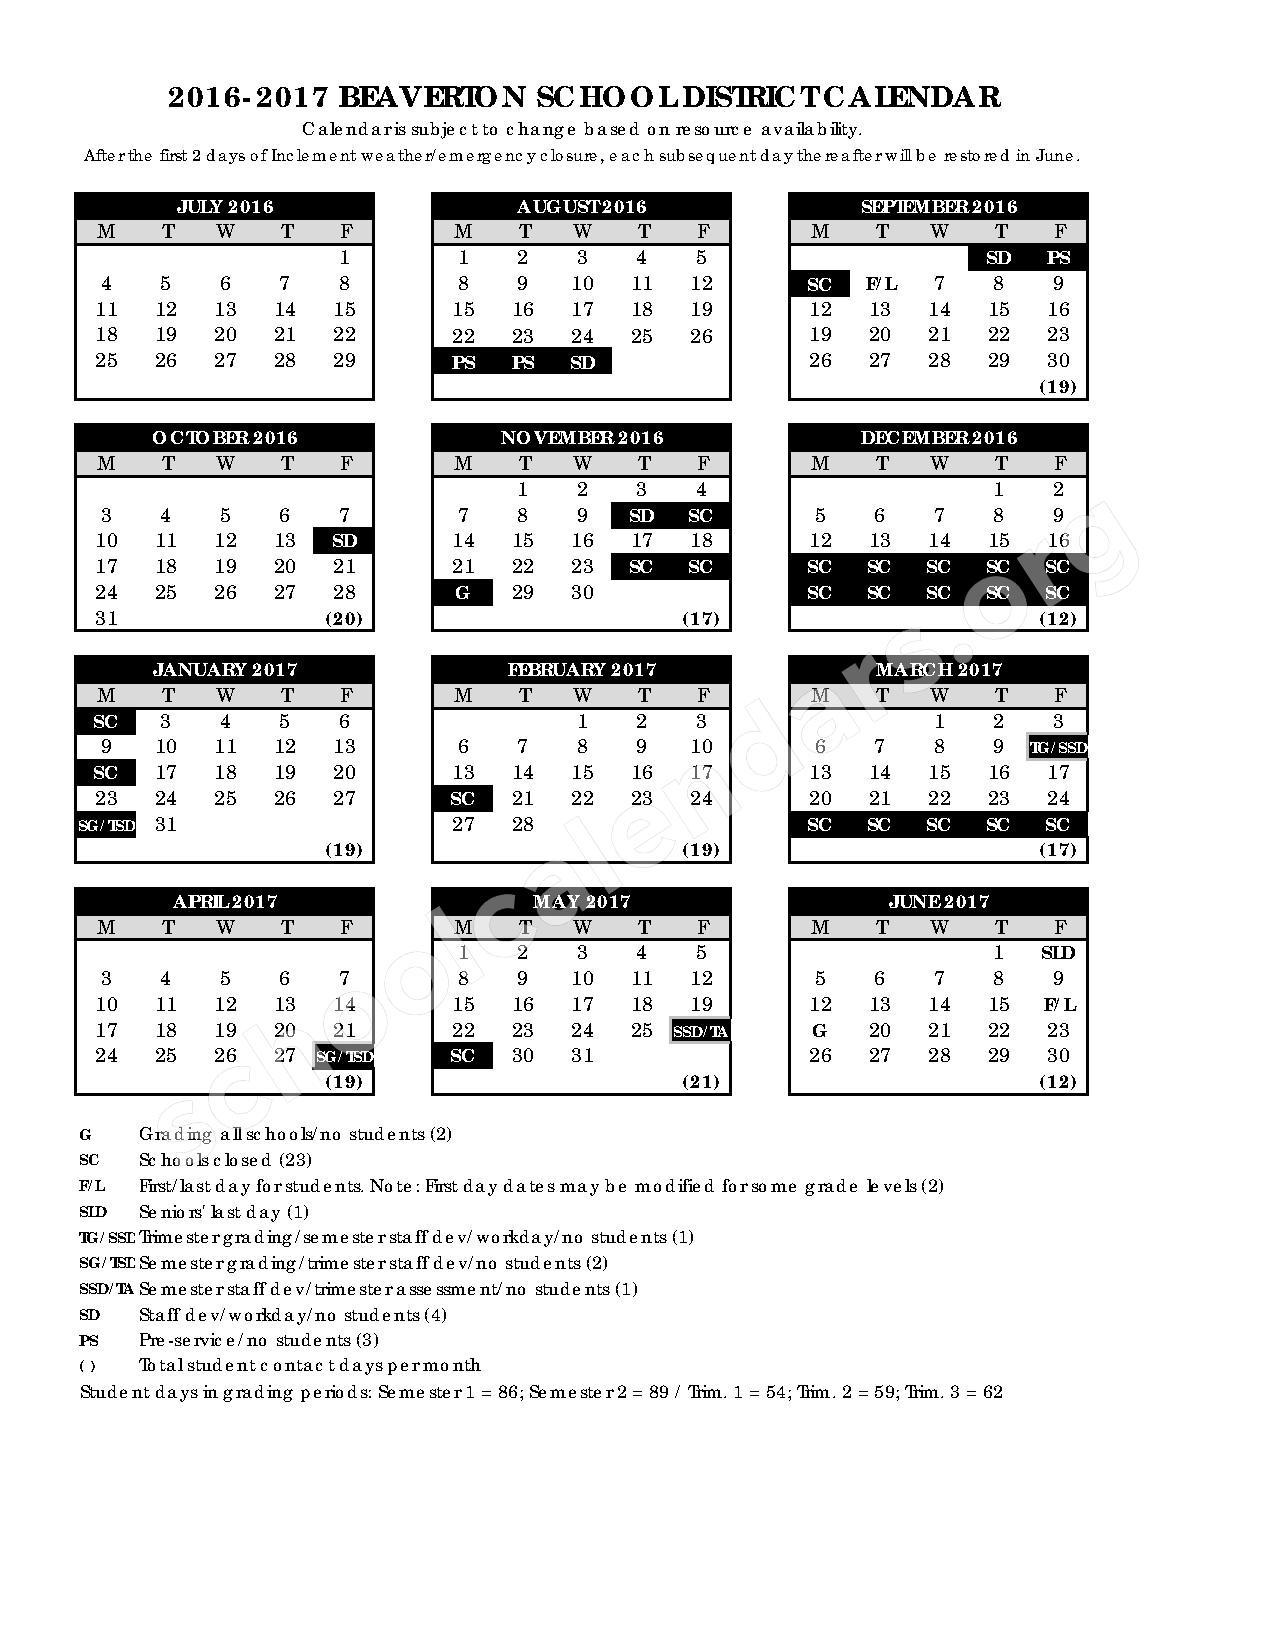 2016 - 2017 School Calendar – Beaverton School District – page 1